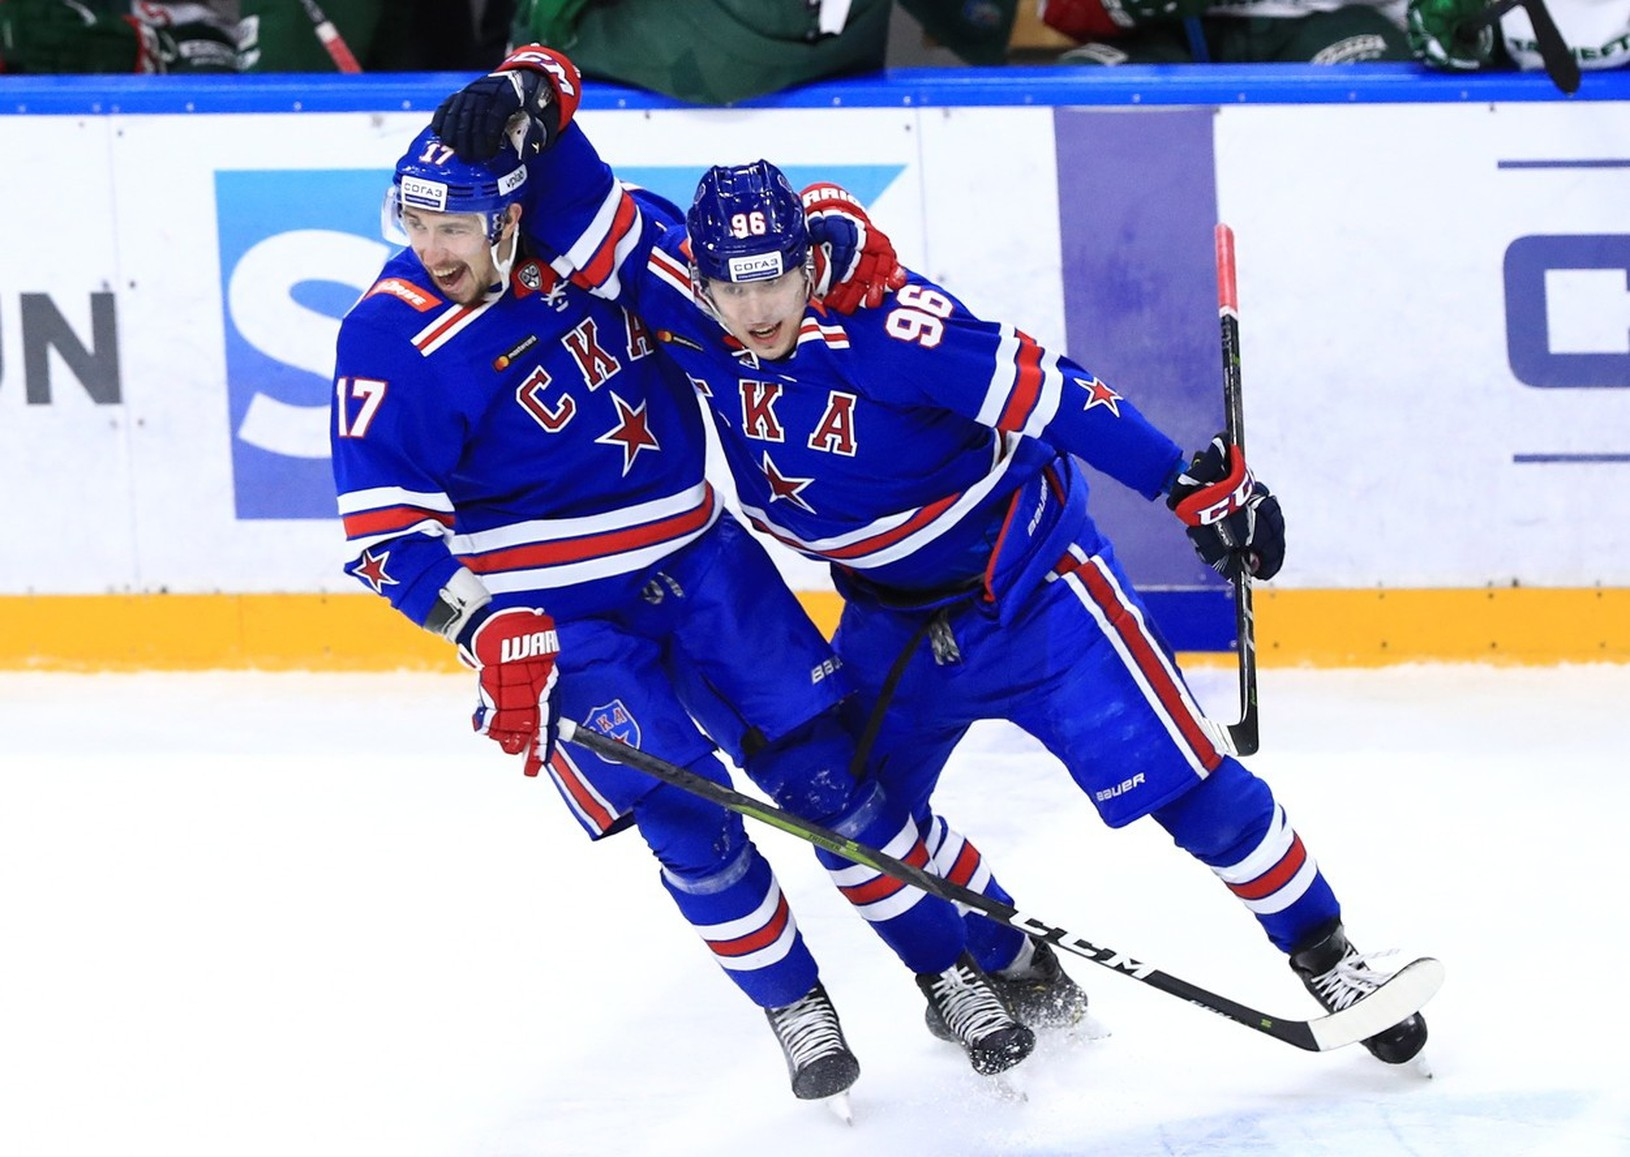 Hokejisti SKA Petrohrad oslavujú